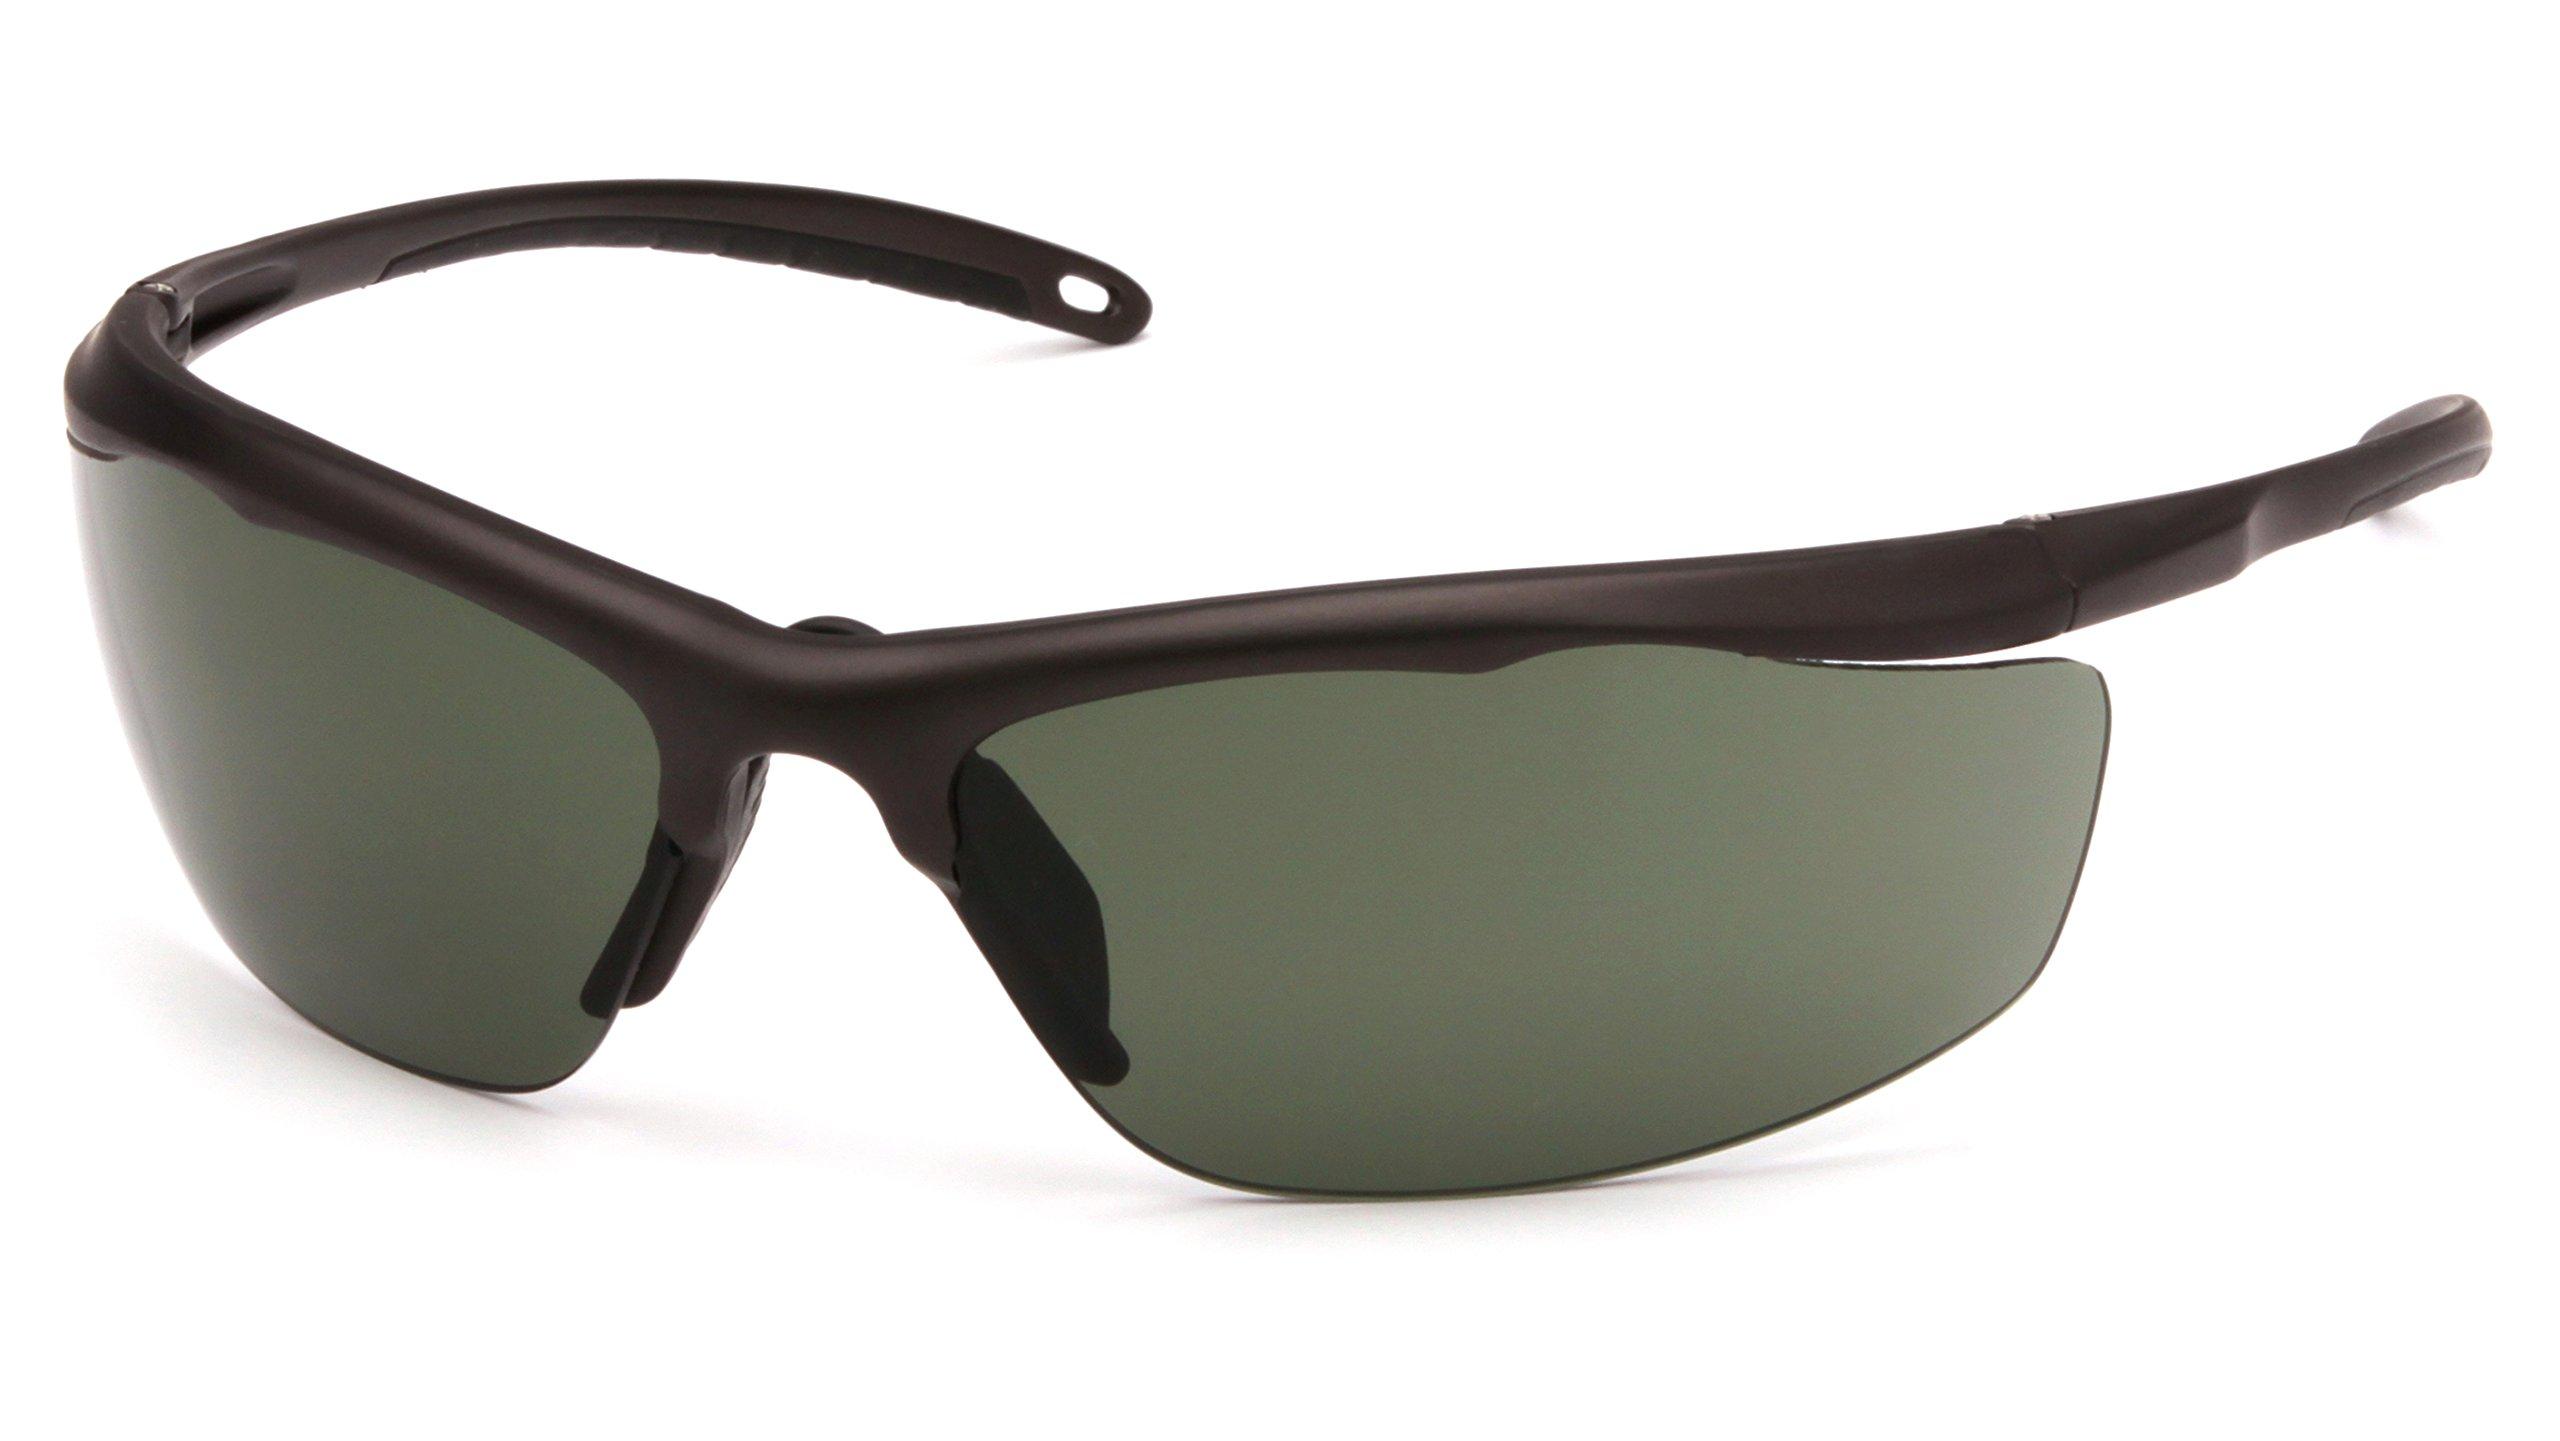 Venture Gear Zumbro Lightweight Sports Style Eyewear, Bronze Frame, Forest Gray Anti-Fog Lens by Venture Gear